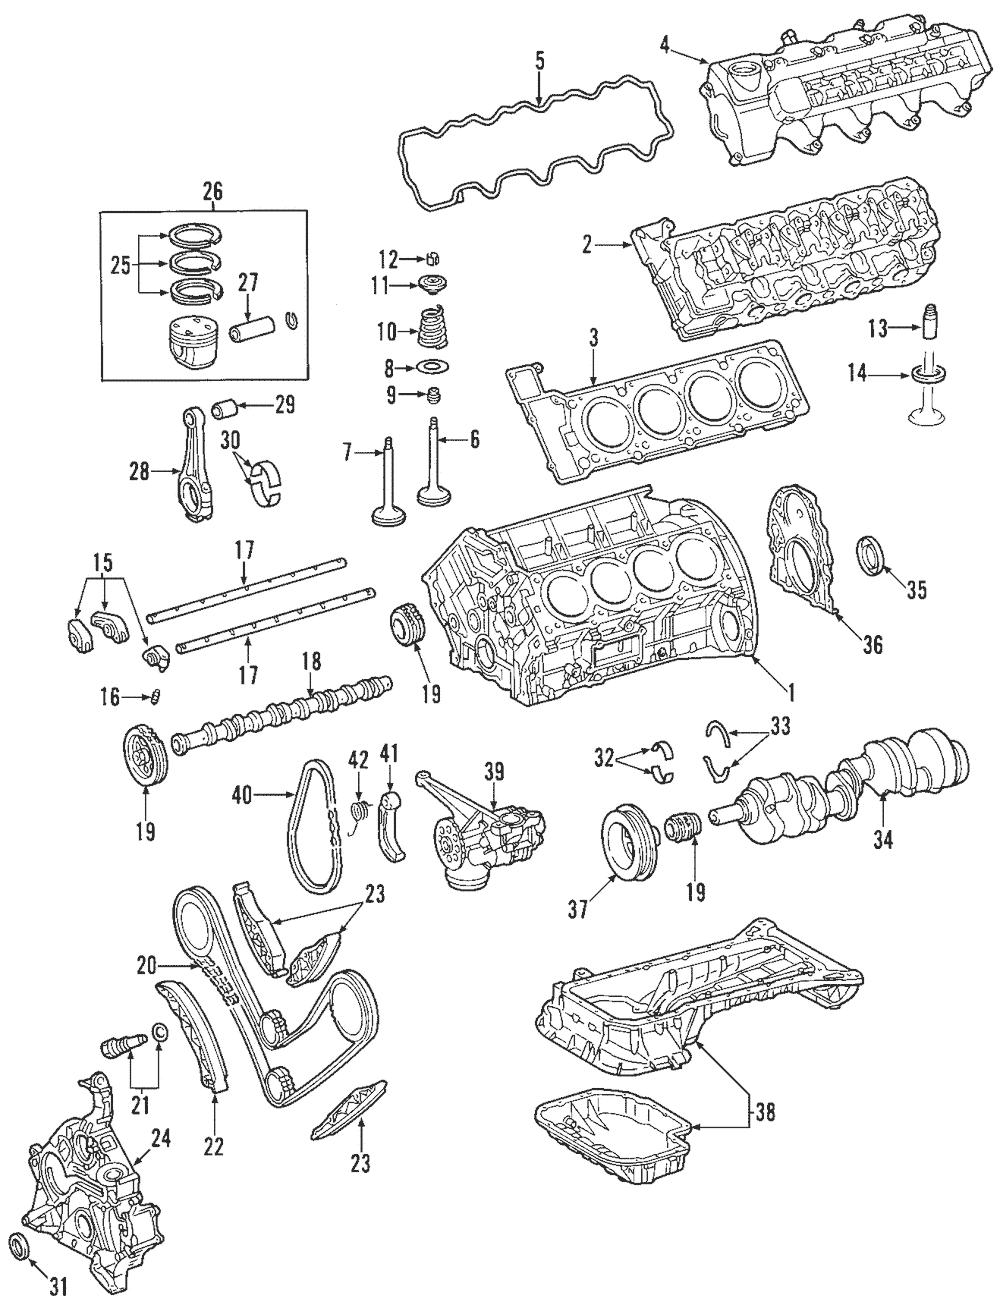 Mercedes Benz C230 Parts Diagram ~ Corbin Thorne